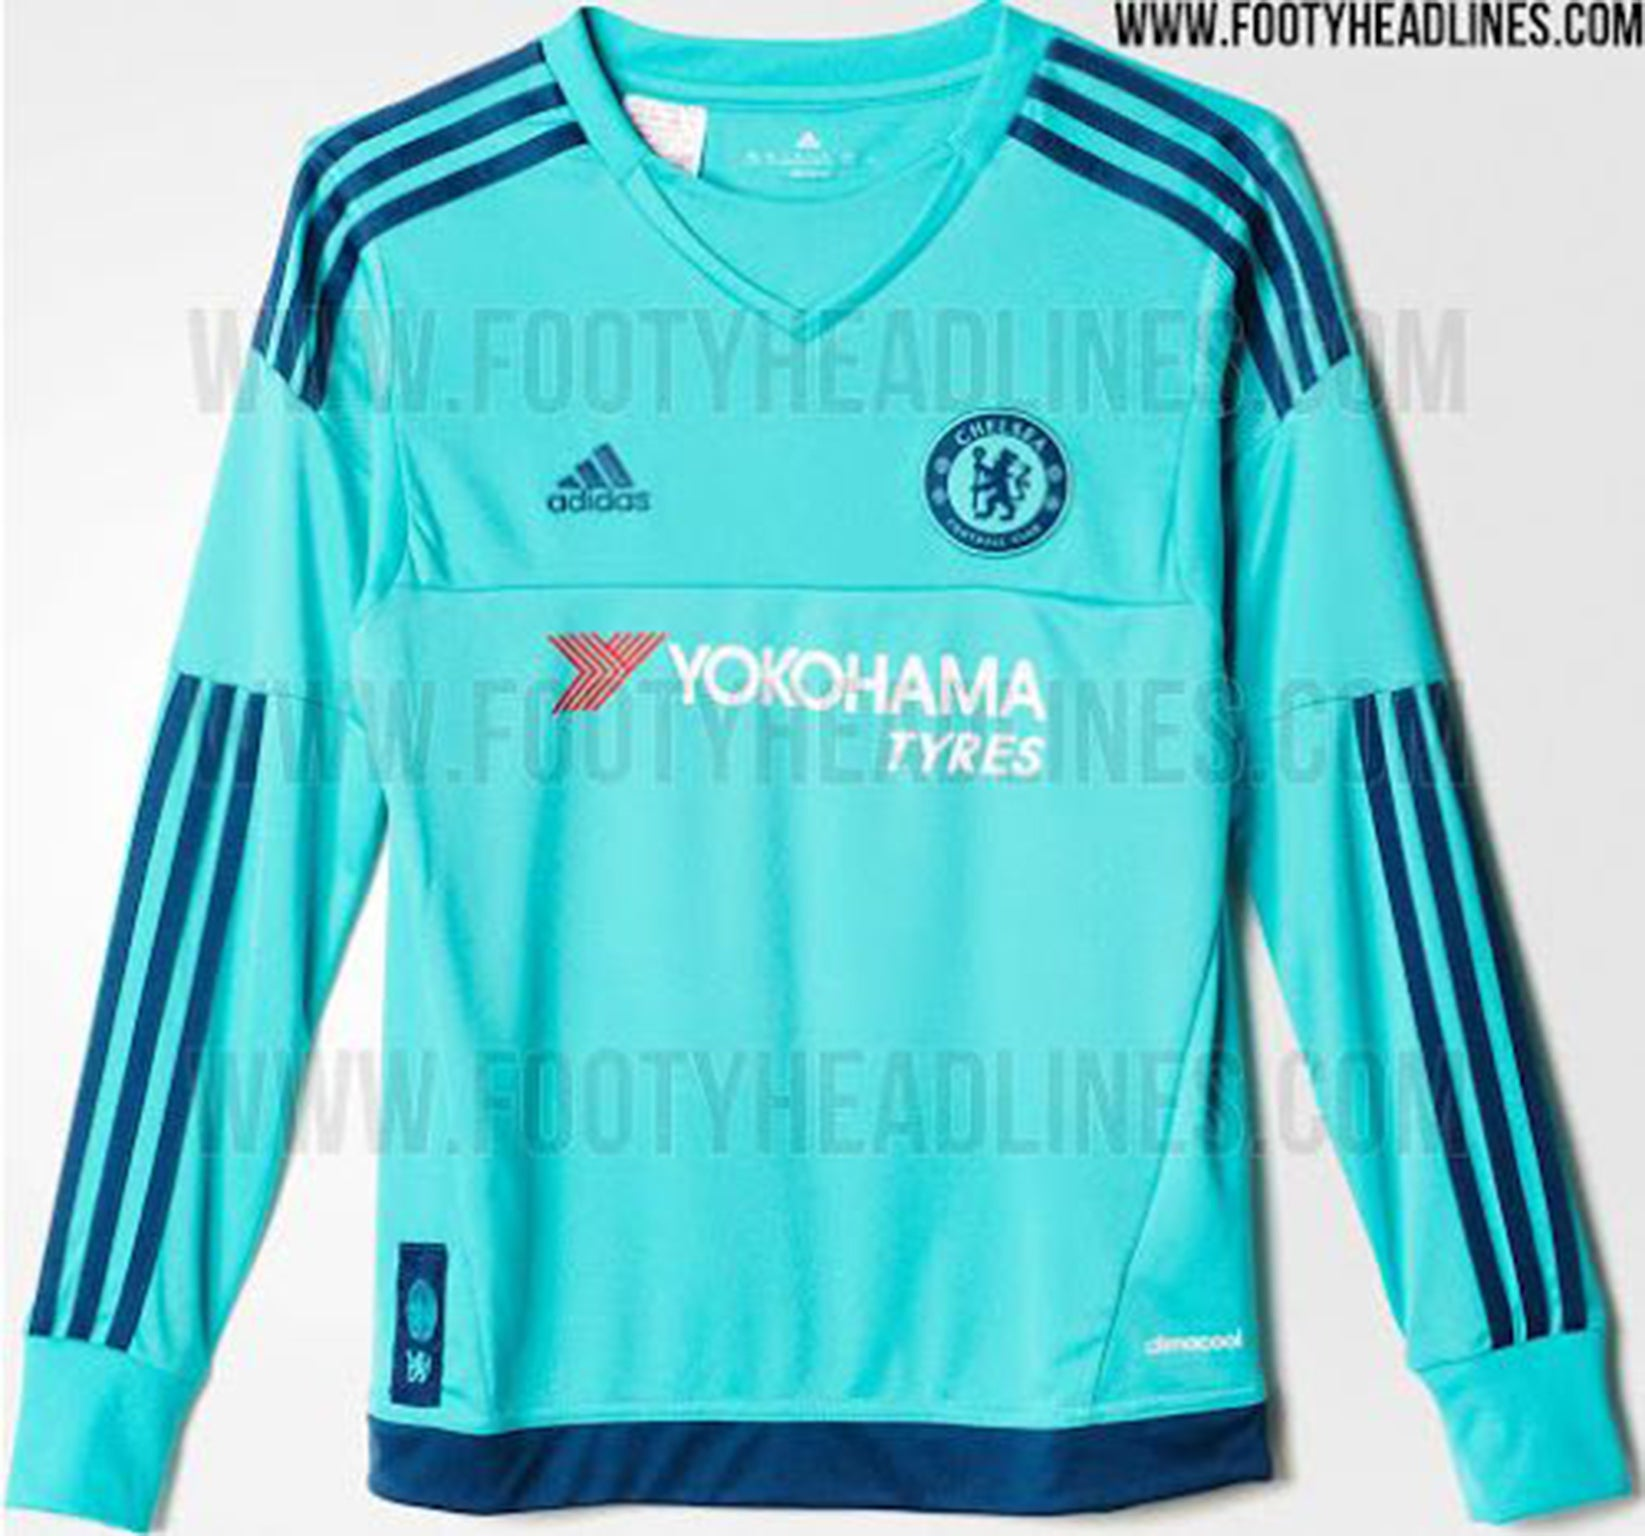 Chelsea 2015/16 goalkeeper kit leaked as new images appear